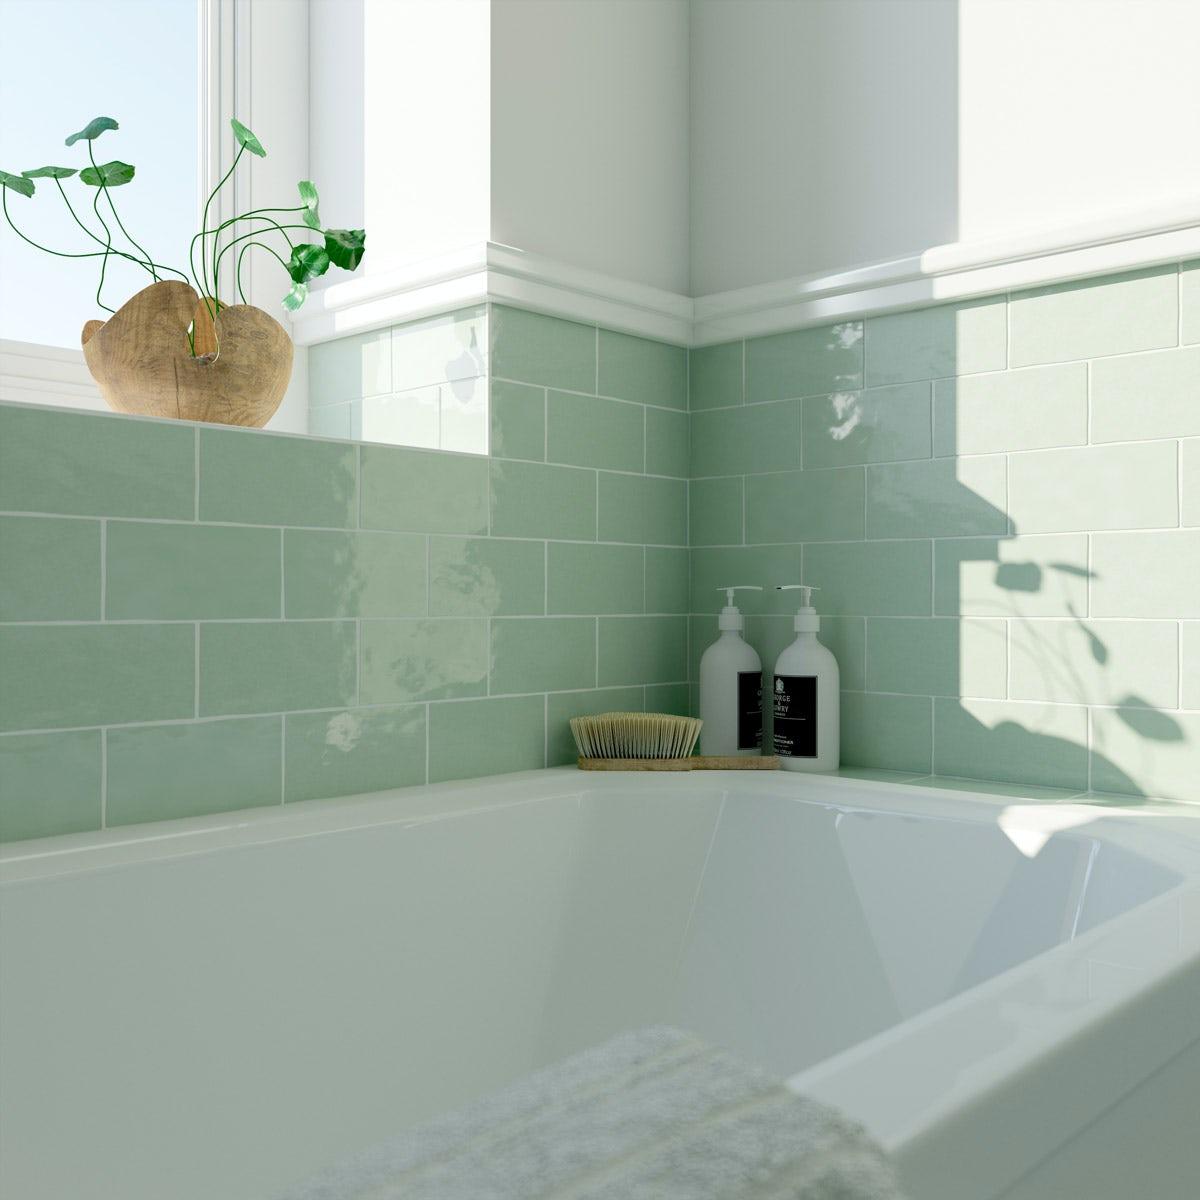 Laura Ashley Artisan eau de nil green wall tile 75mm x 150mm